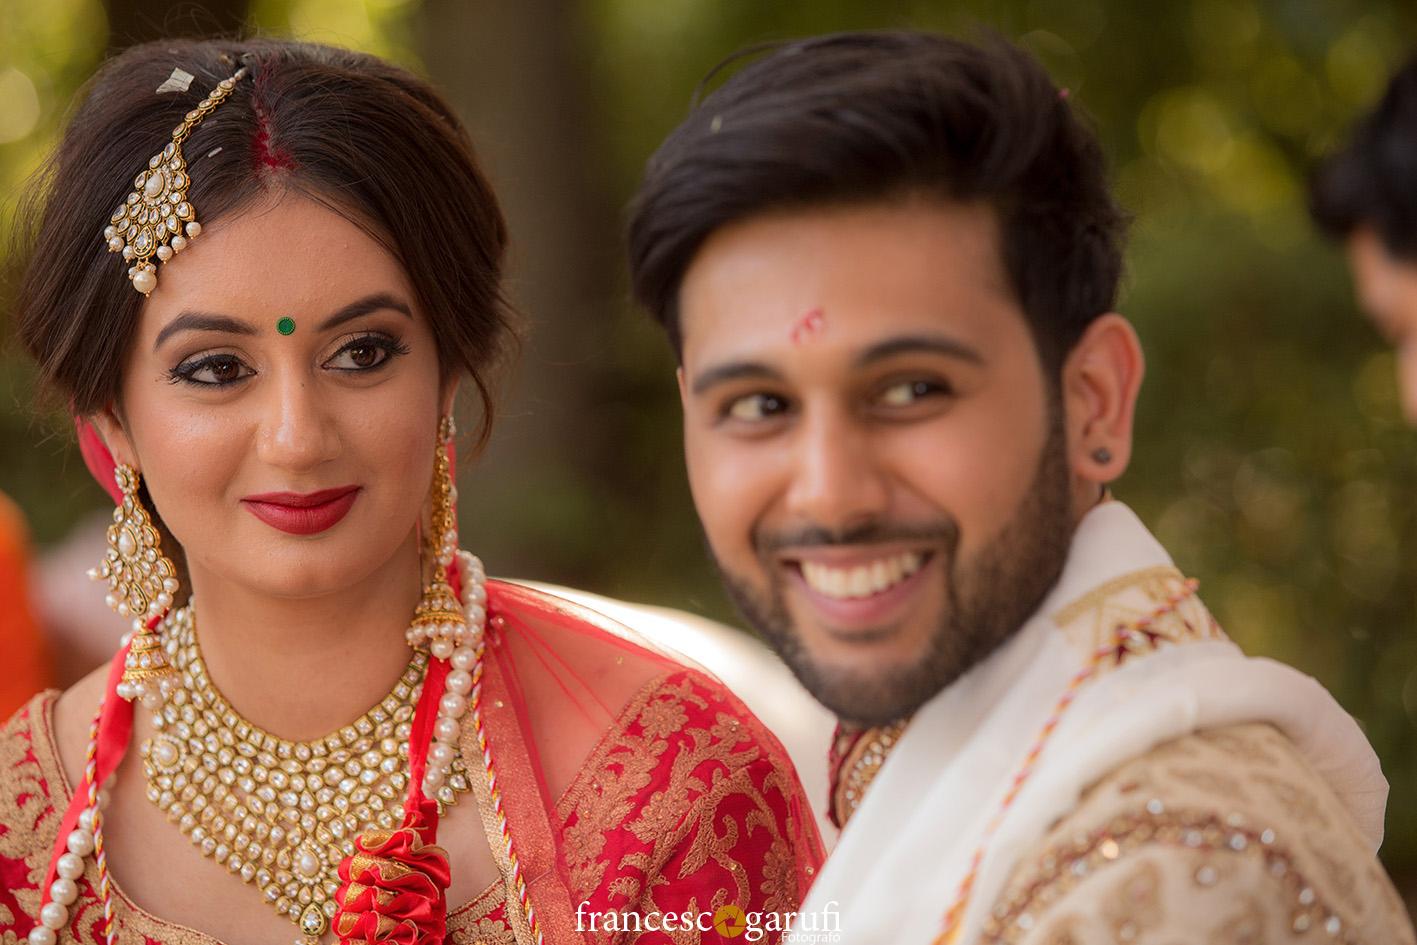 sguardi felici di due sposi indiani in Toscana